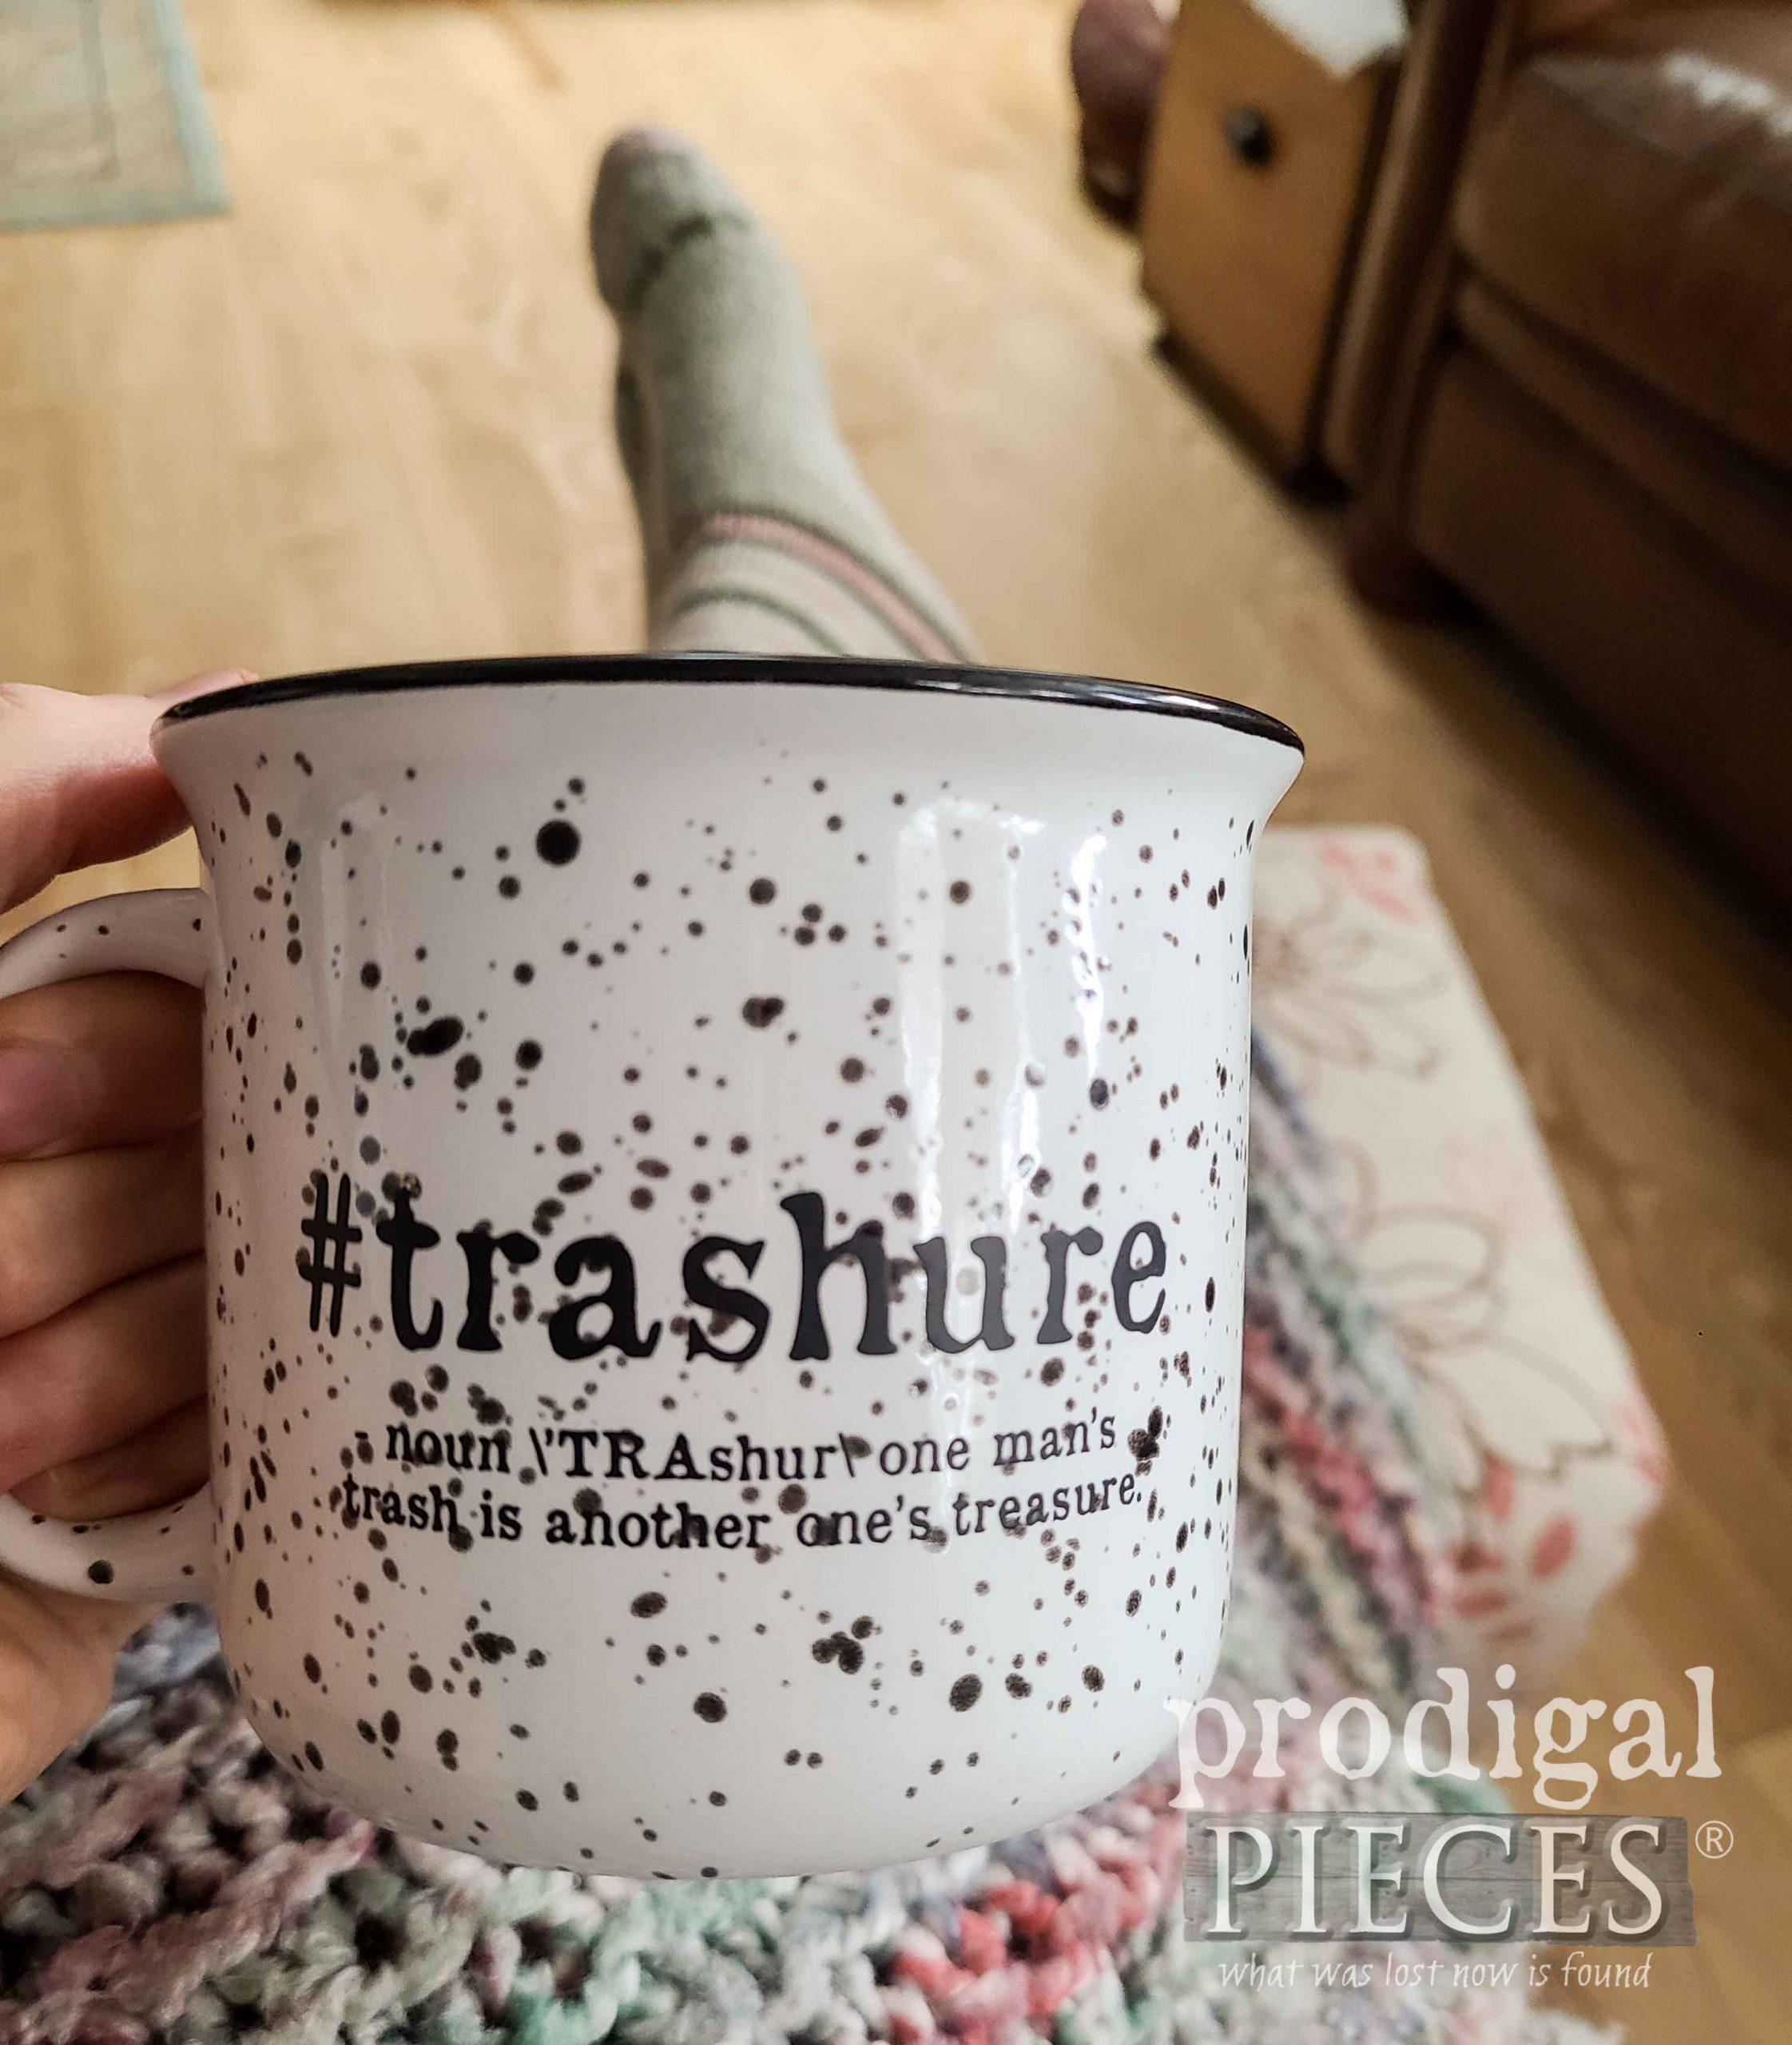 Prodigal Pieces #trashure campfire mug by Larissa at prodigalpieces.com #prodigalpieces